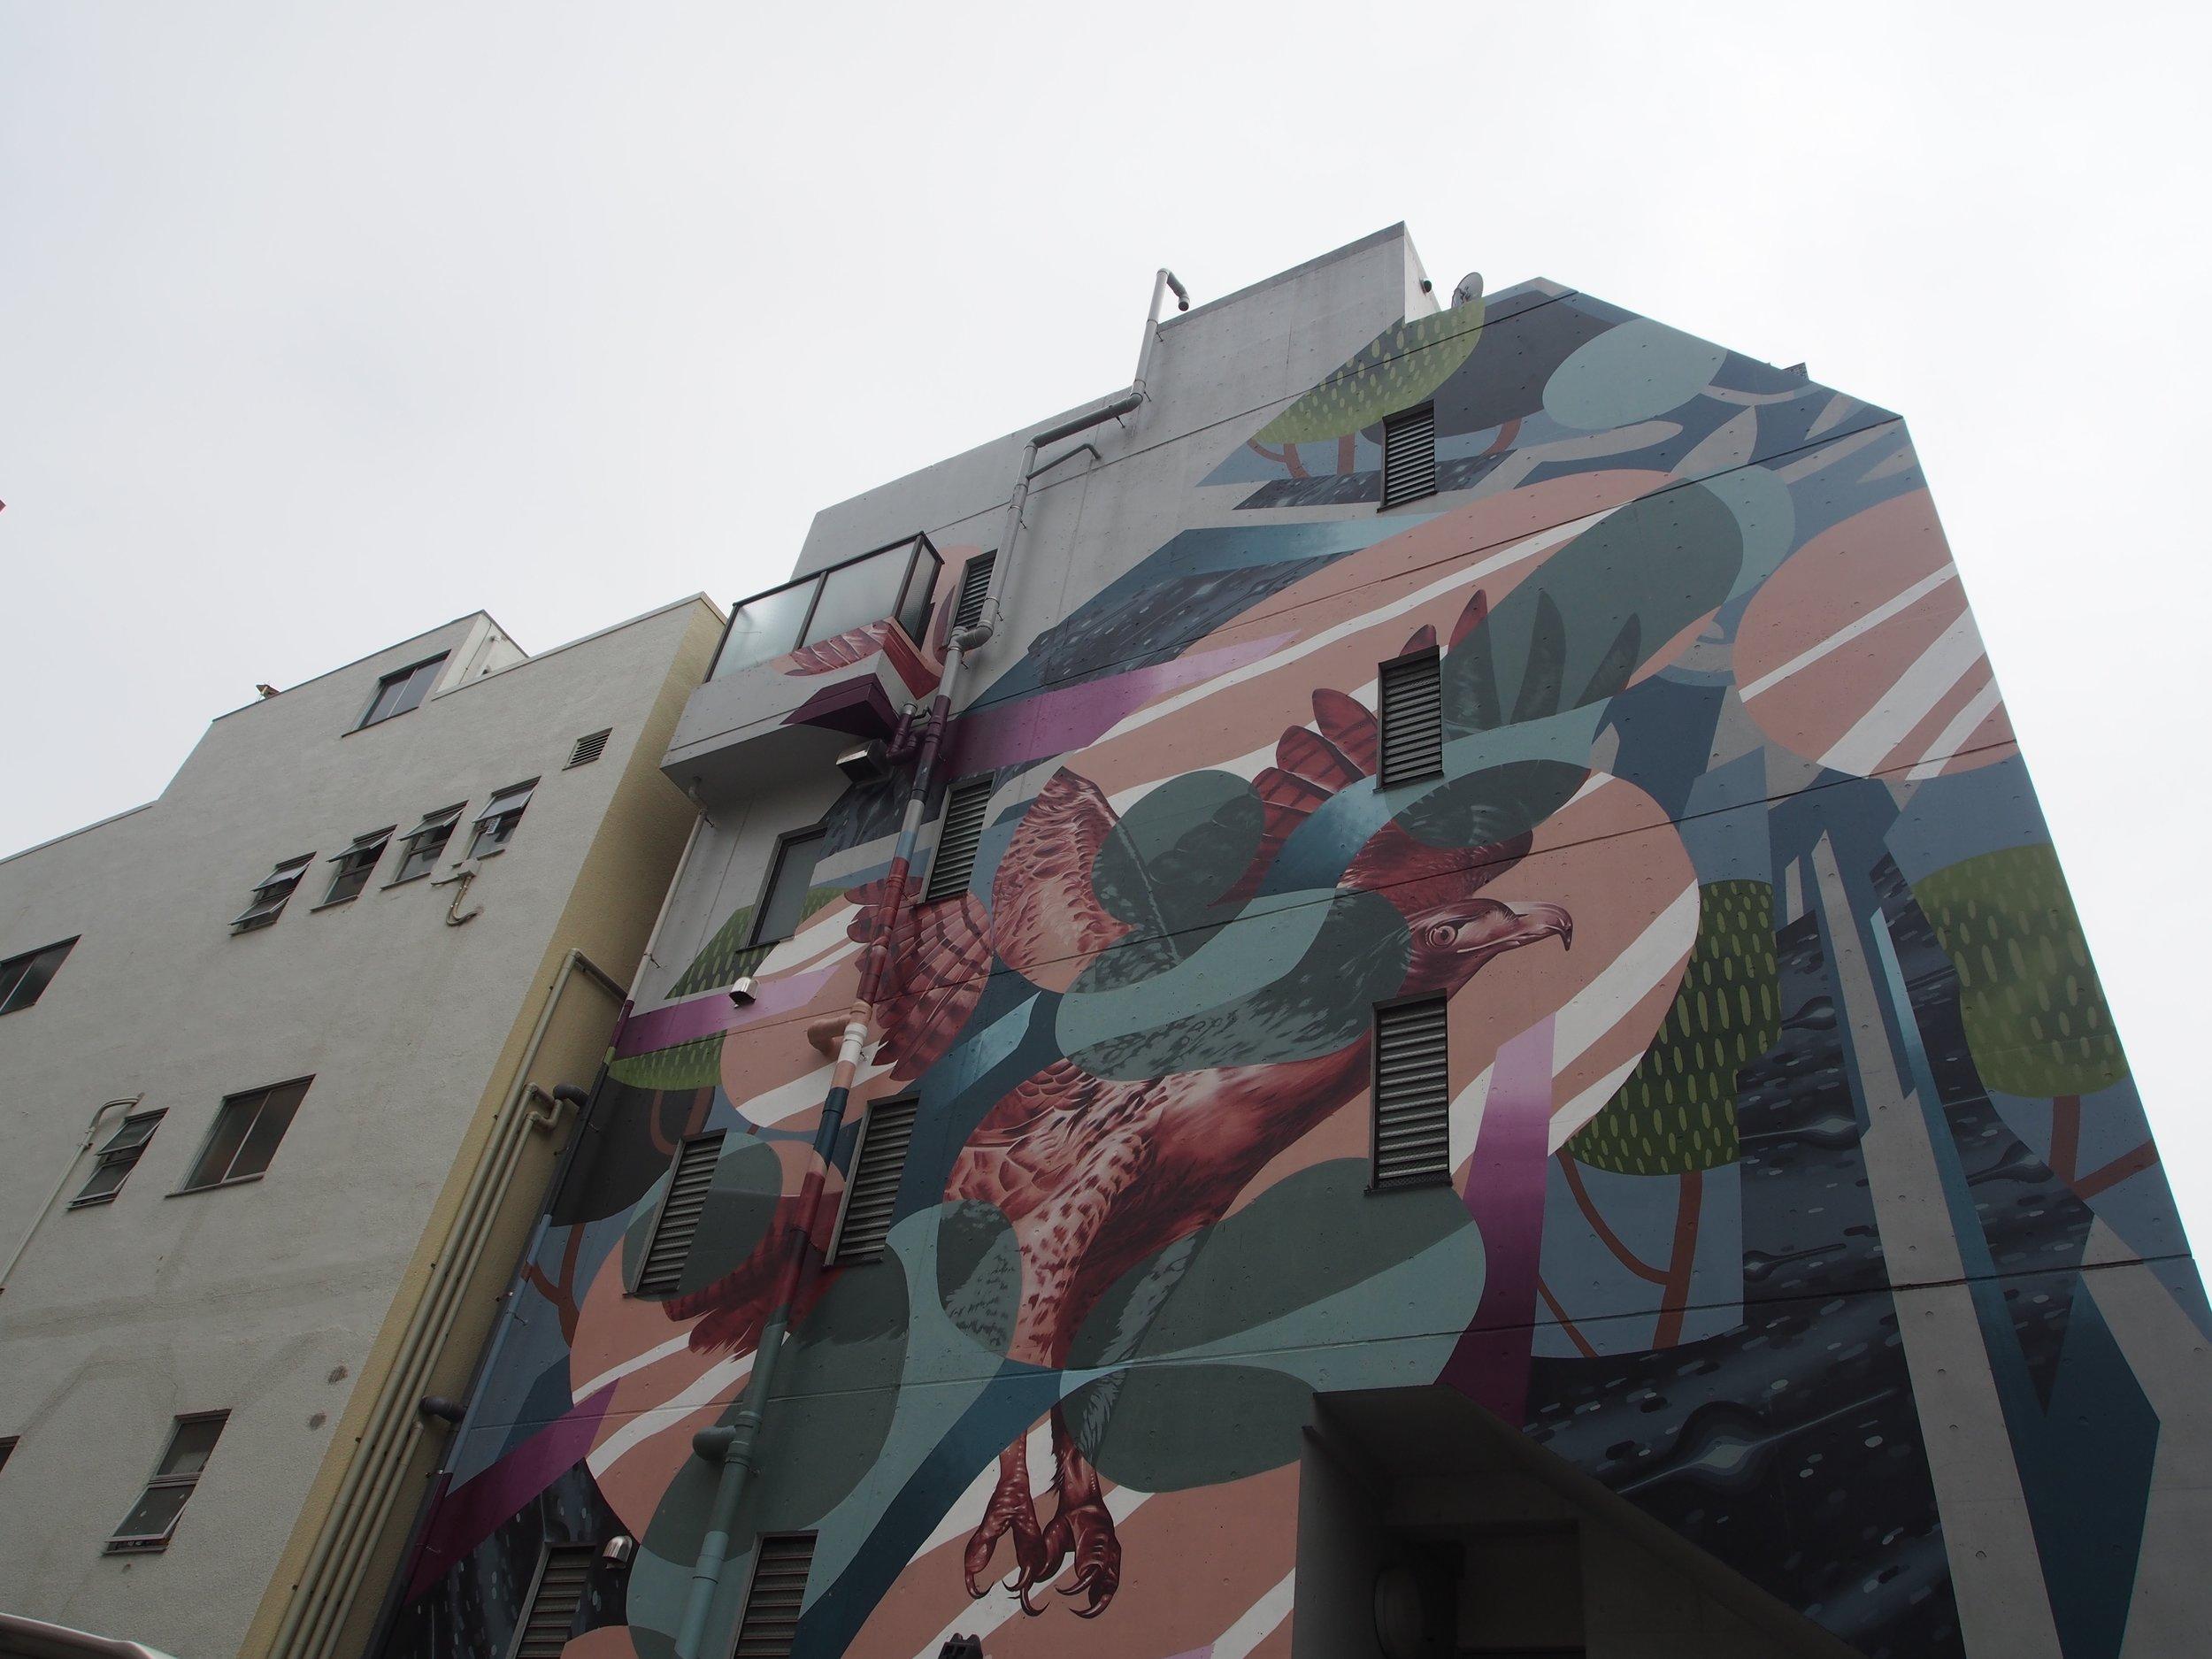 Mural City Project Koenji - Client/Partner: 杉並区中央線あるあるプロジェクトDate: 2016 - NowDescription: 高円寺の街中に壁画を制作し、高円寺を日本初のミューラルシティーにするプロジェクト。Artist: Yohei Takahashi, Tsuyoshi Nigamushi, Whole 9, Yuji Oda, Shogo Iwakiri